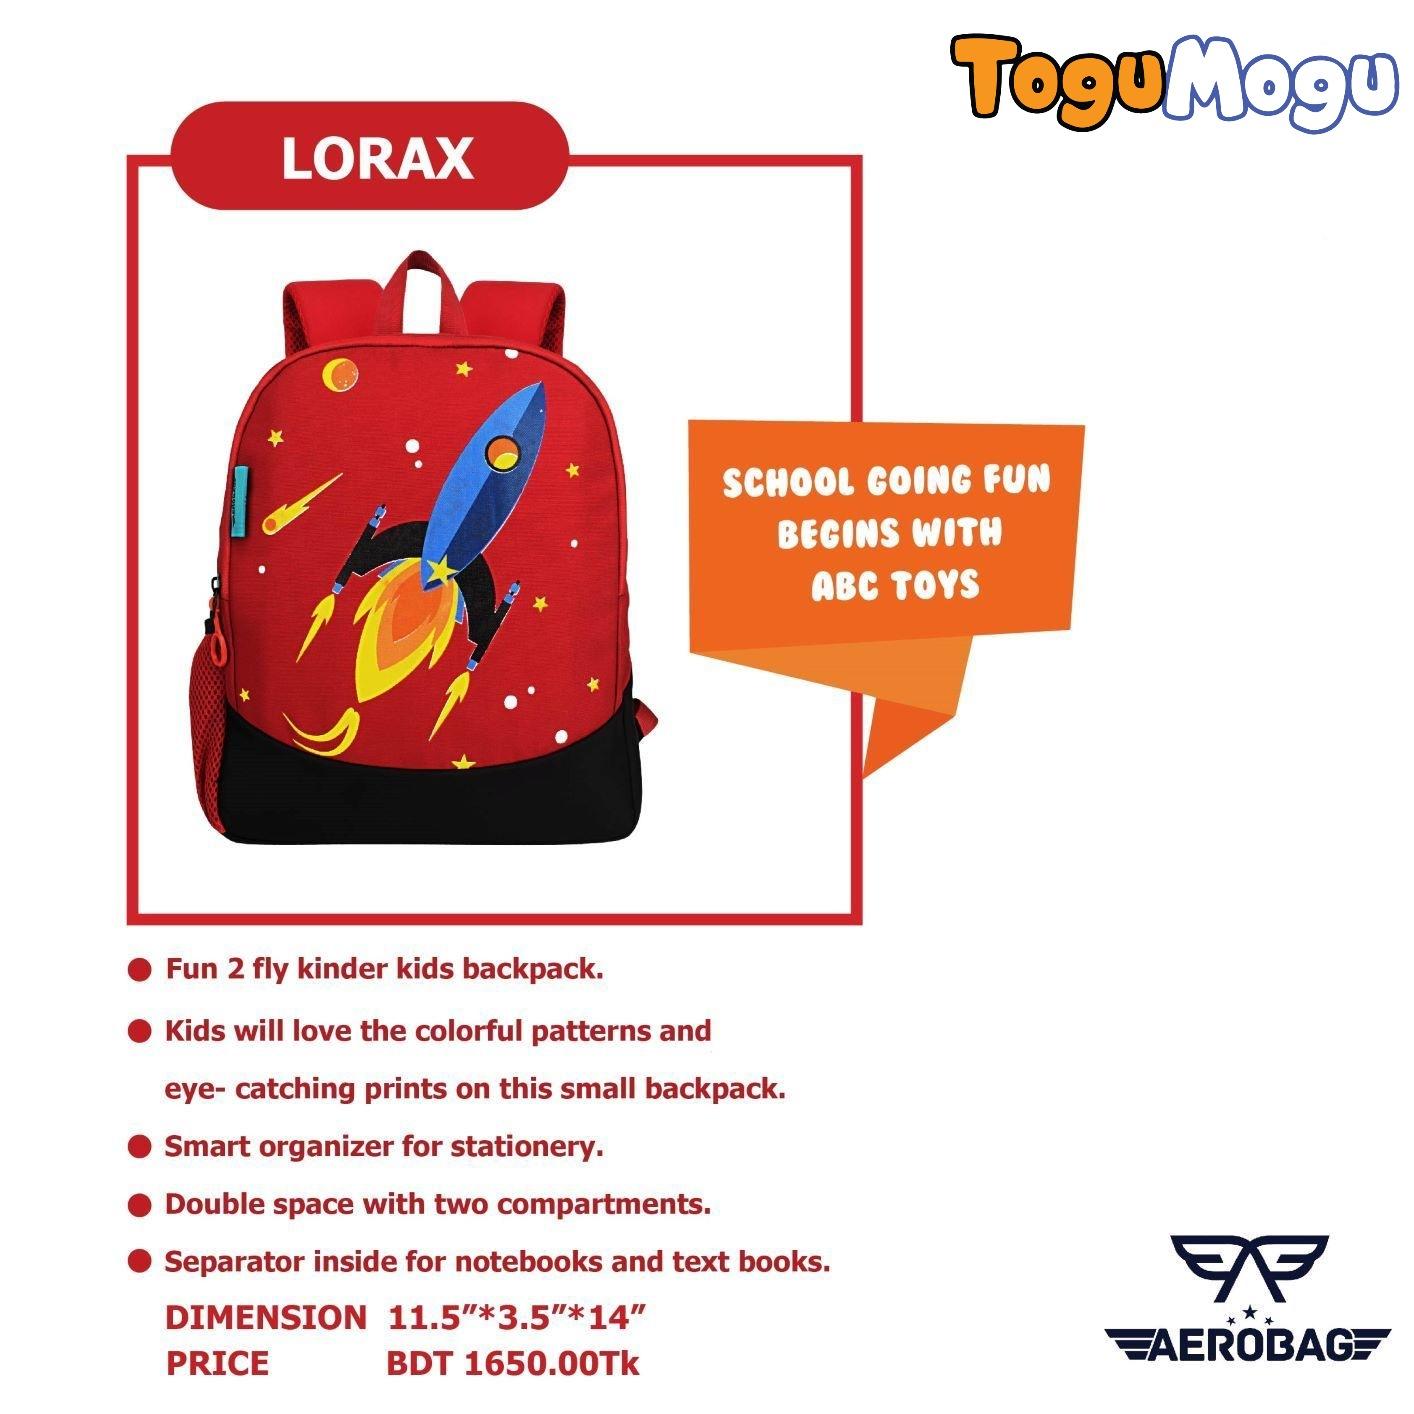 AEROBAG AER009 Lorax Space